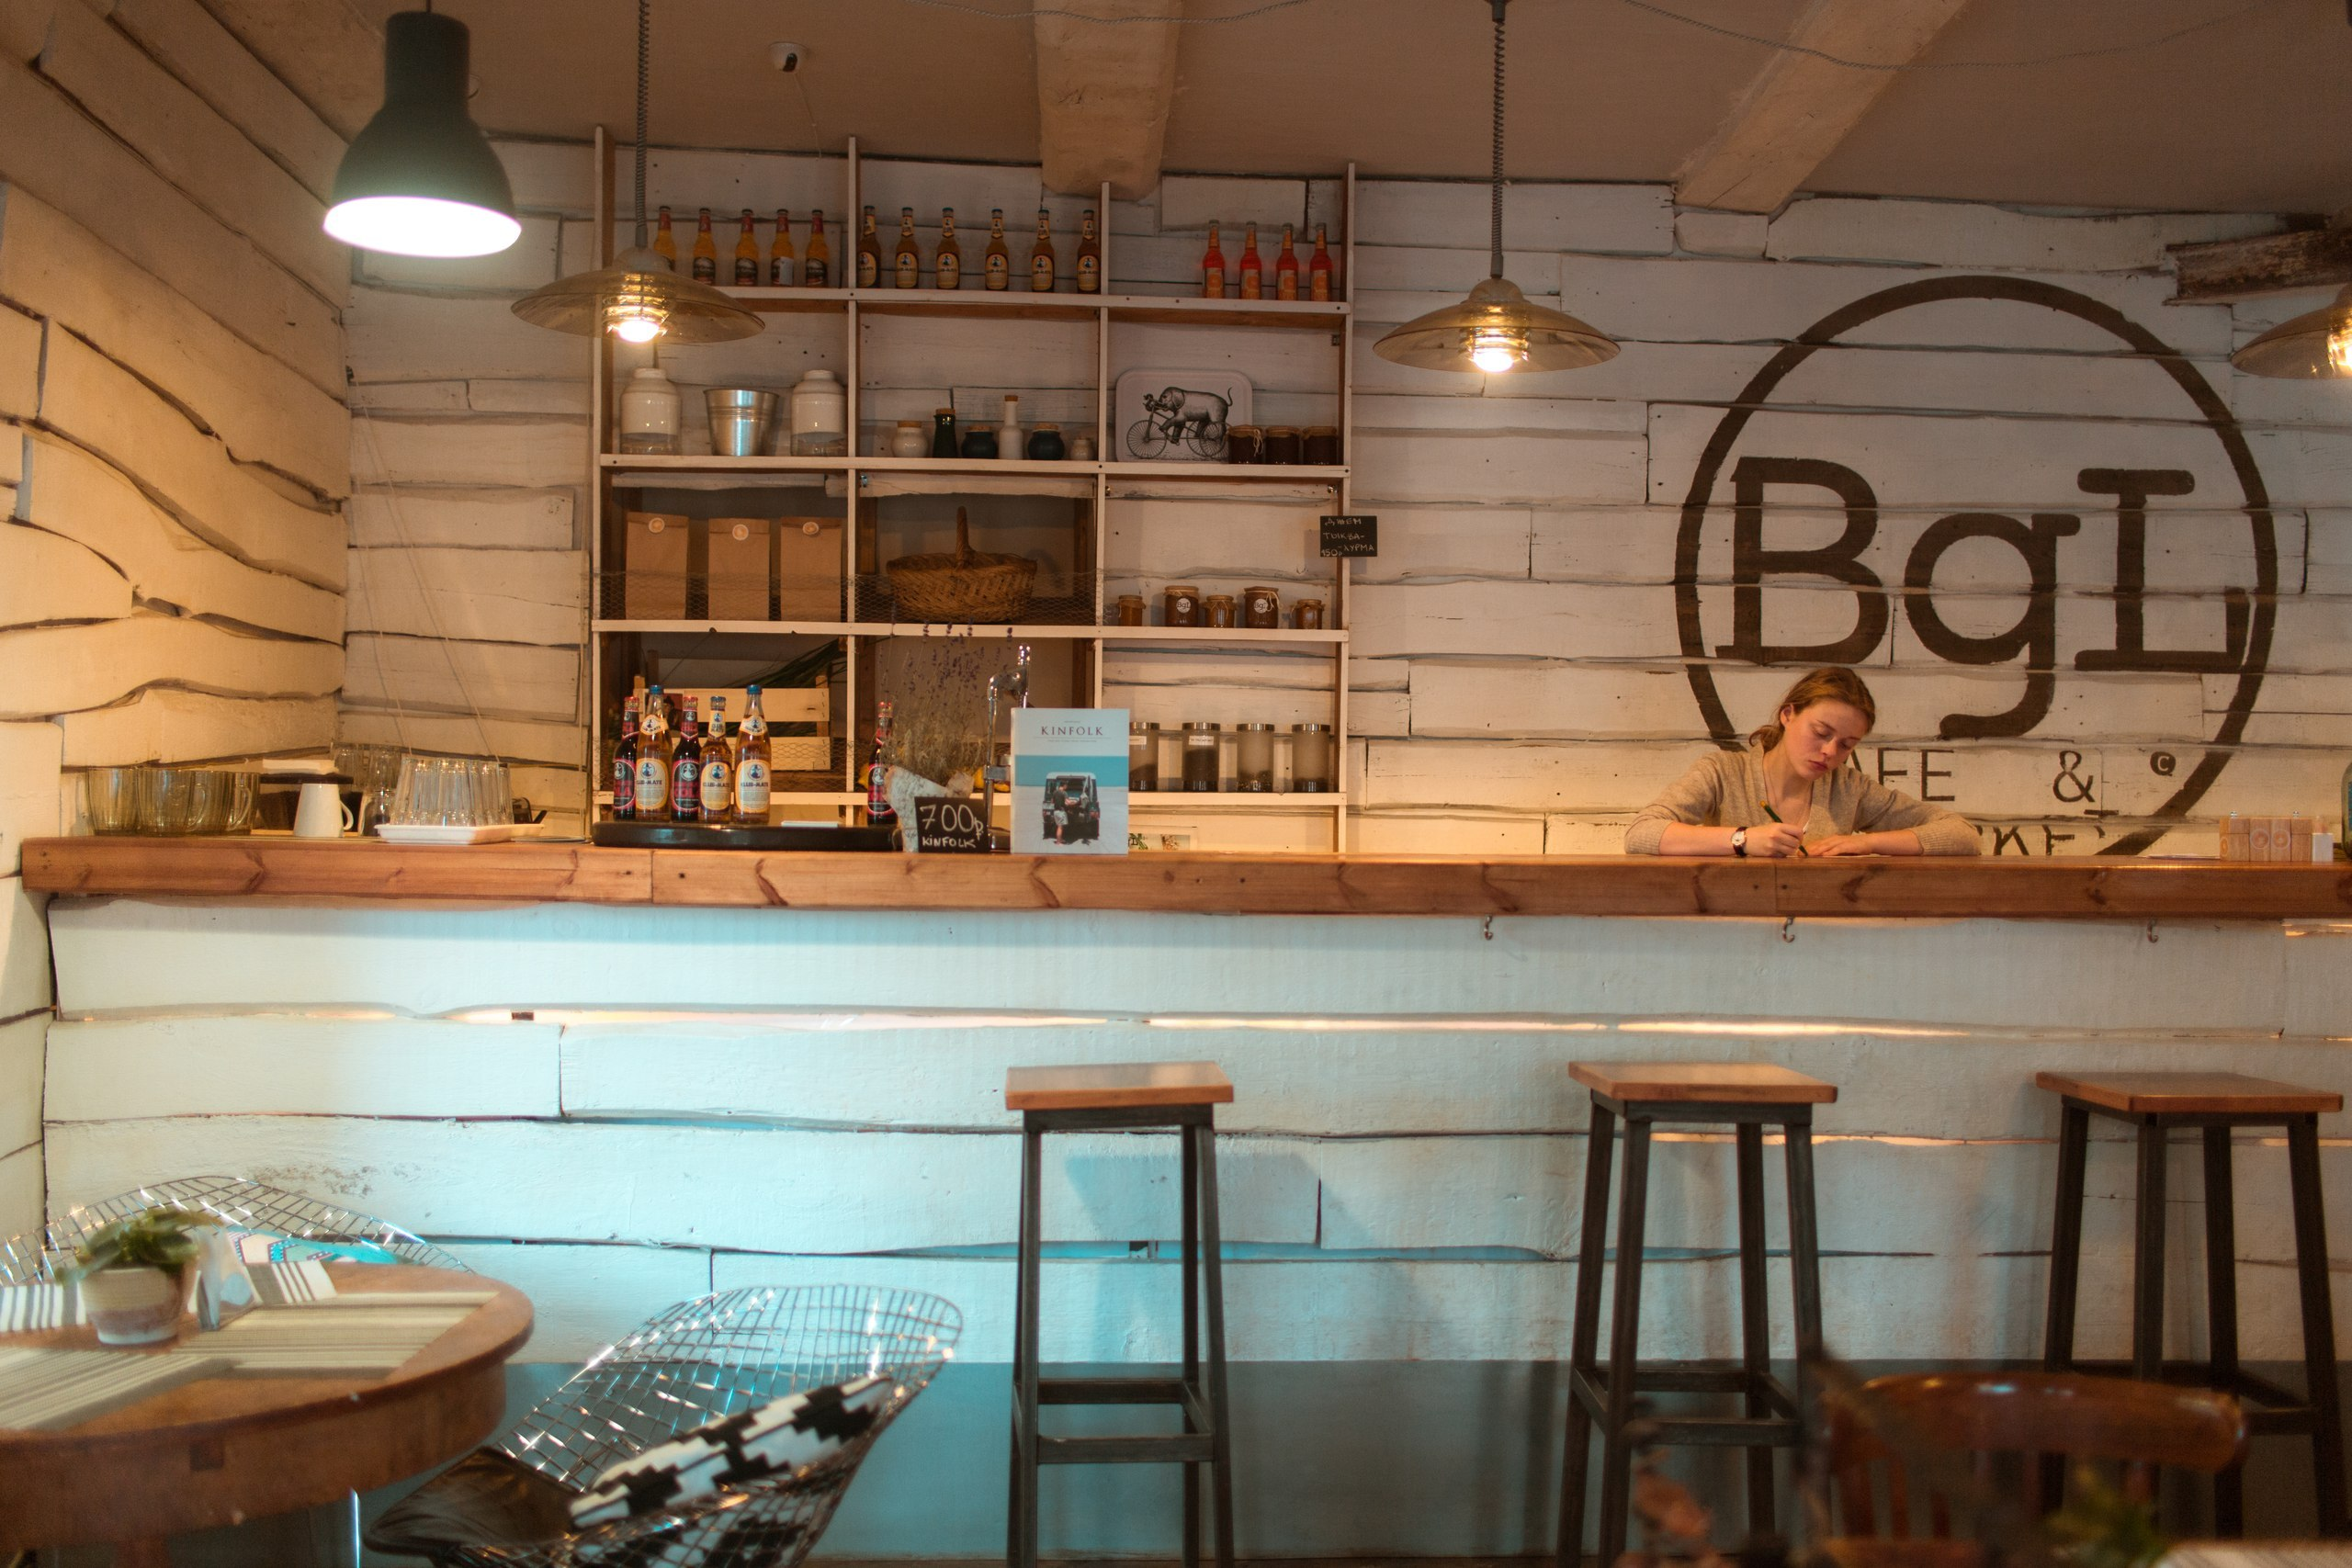 BGL-cafe & market